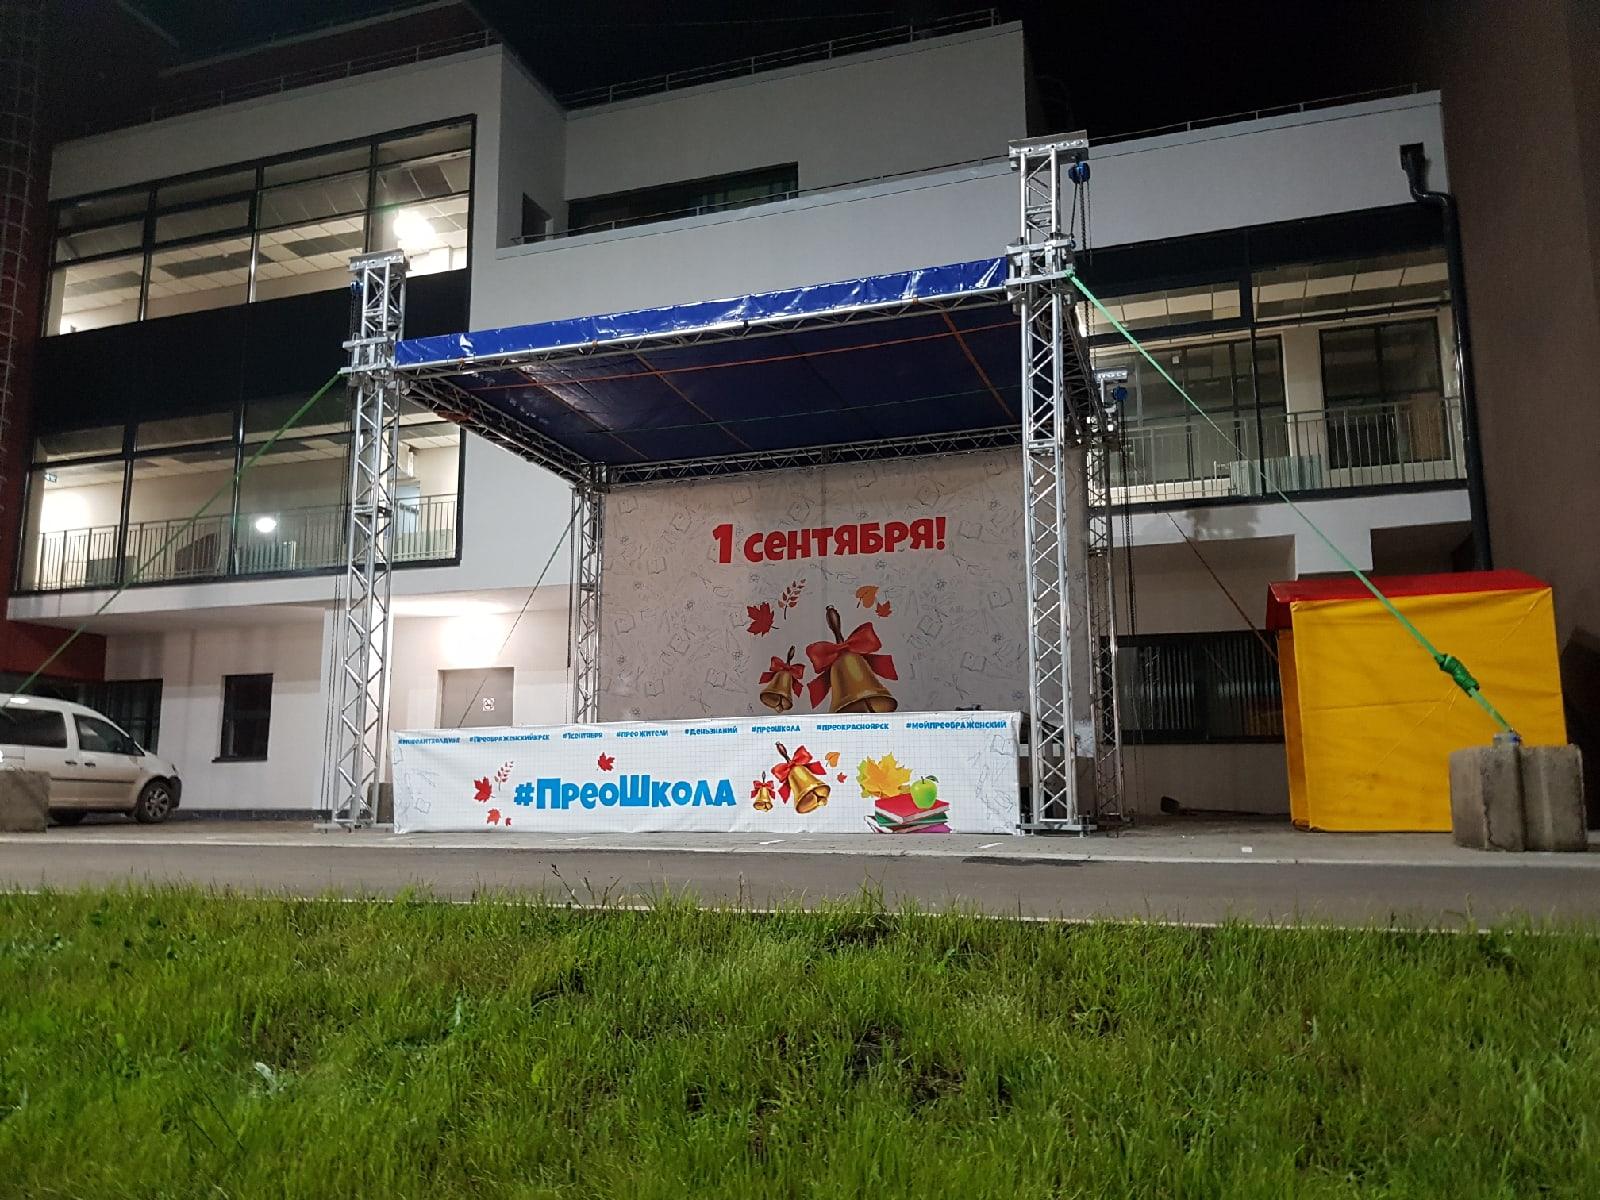 Аренда сцены в Красноярске, прокат граун